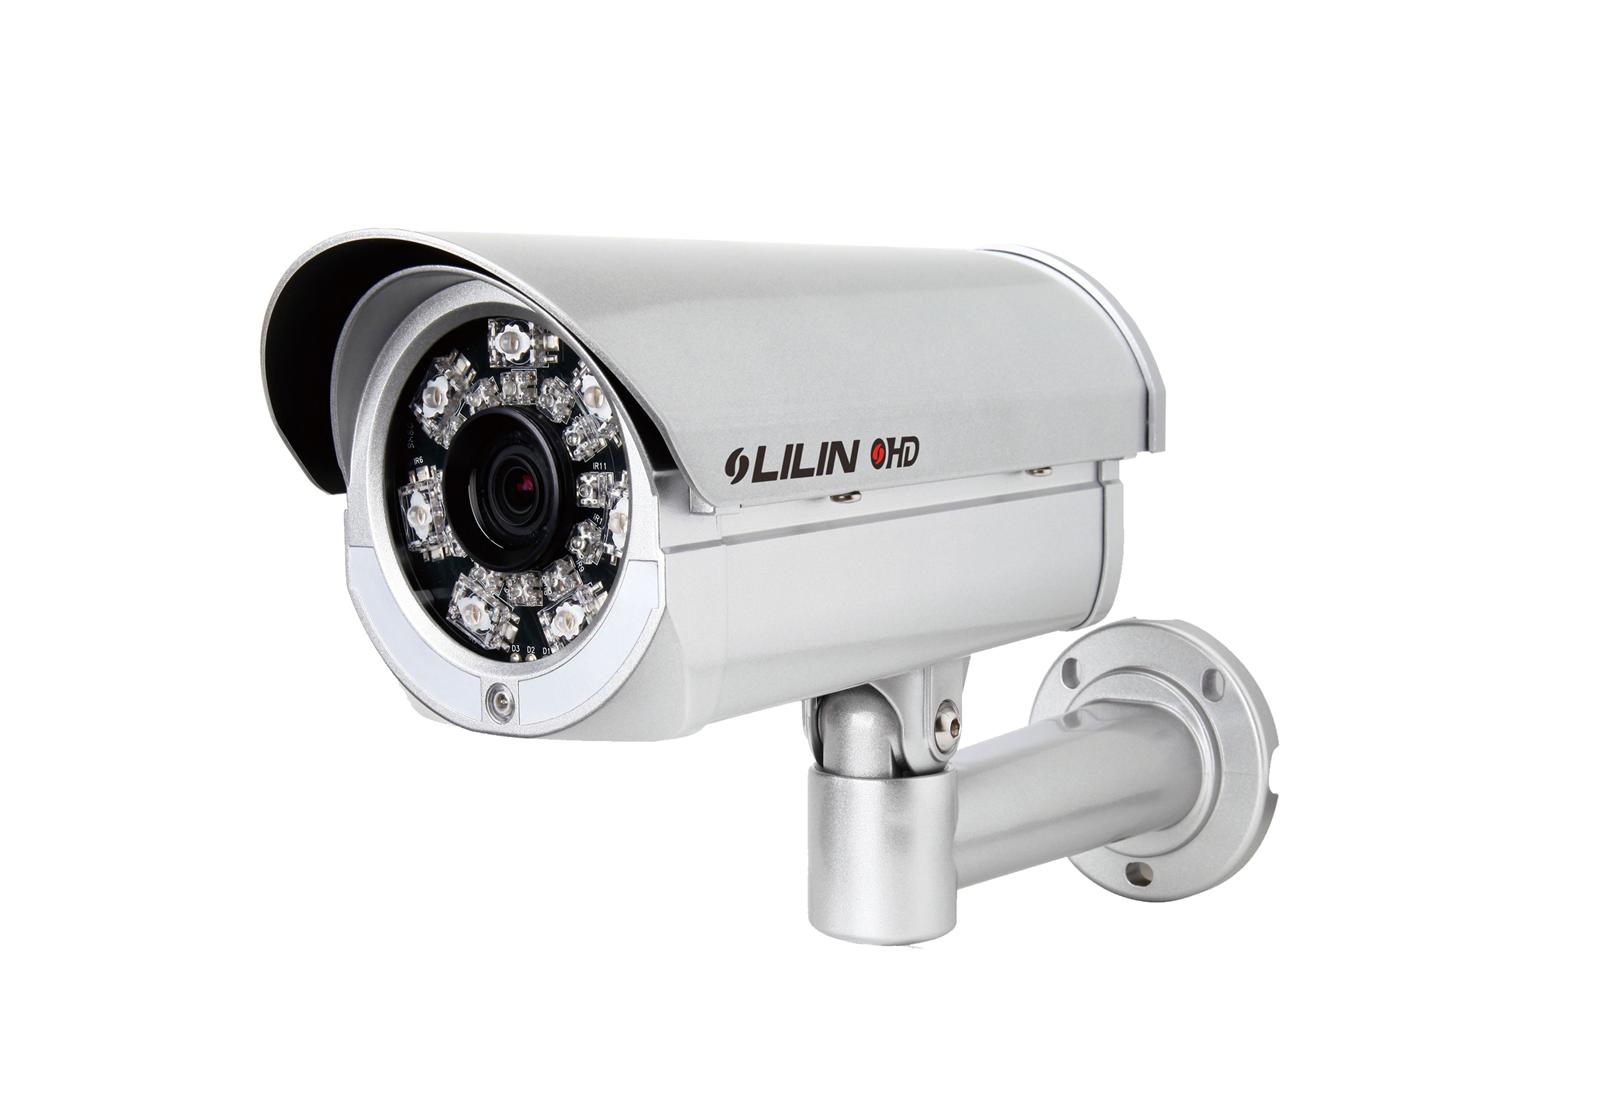 CCTV Products| INFINIZE CORPTECH PVT LTD |Cctv Product